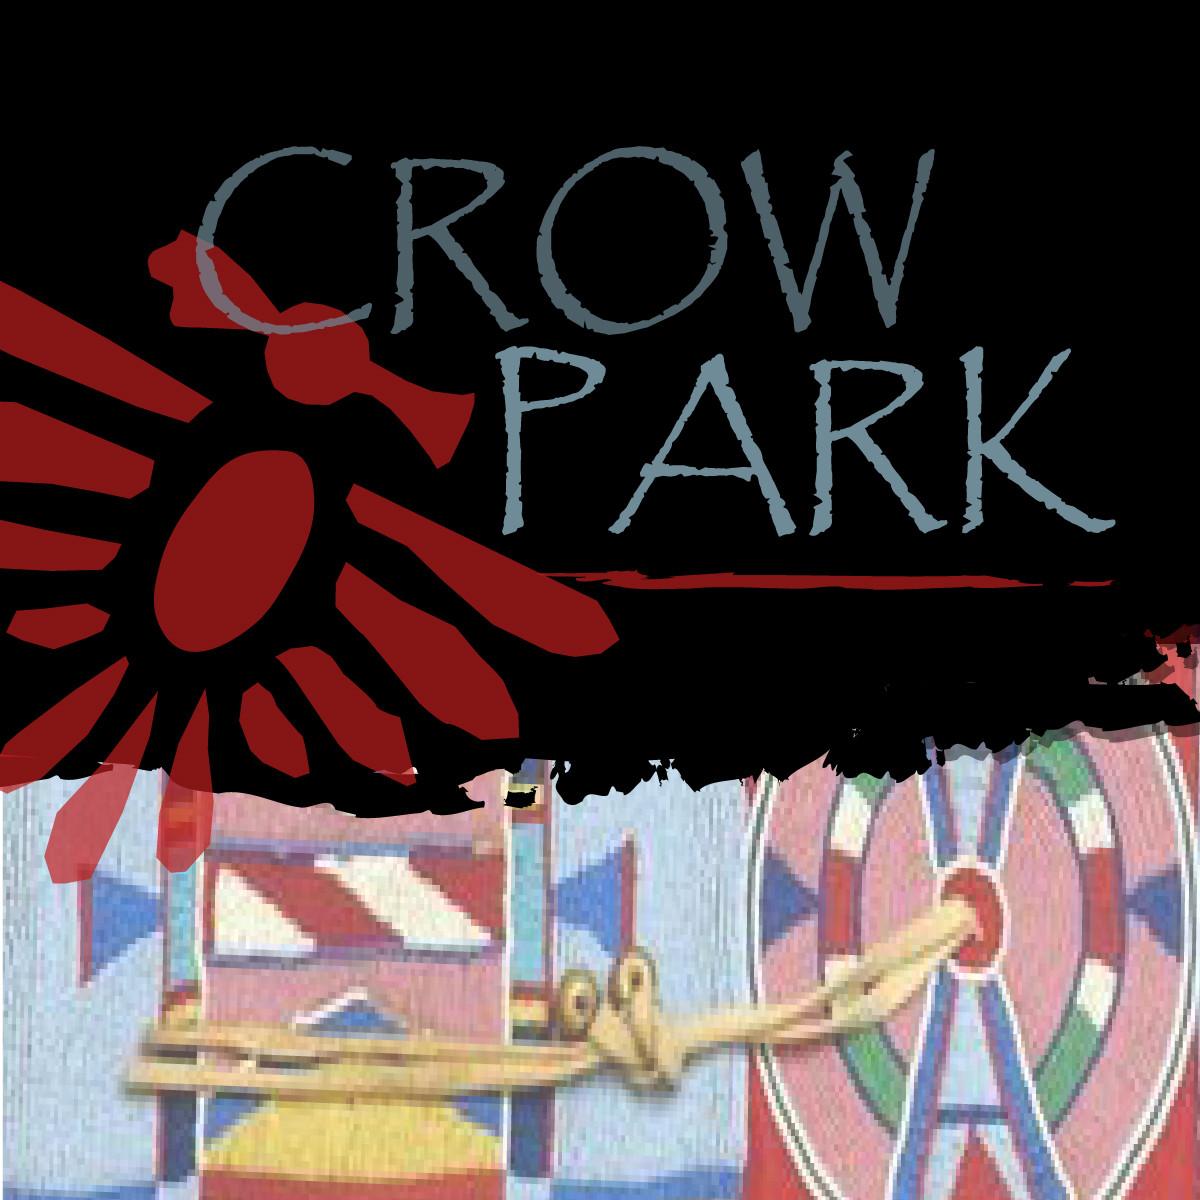 CROW PARK